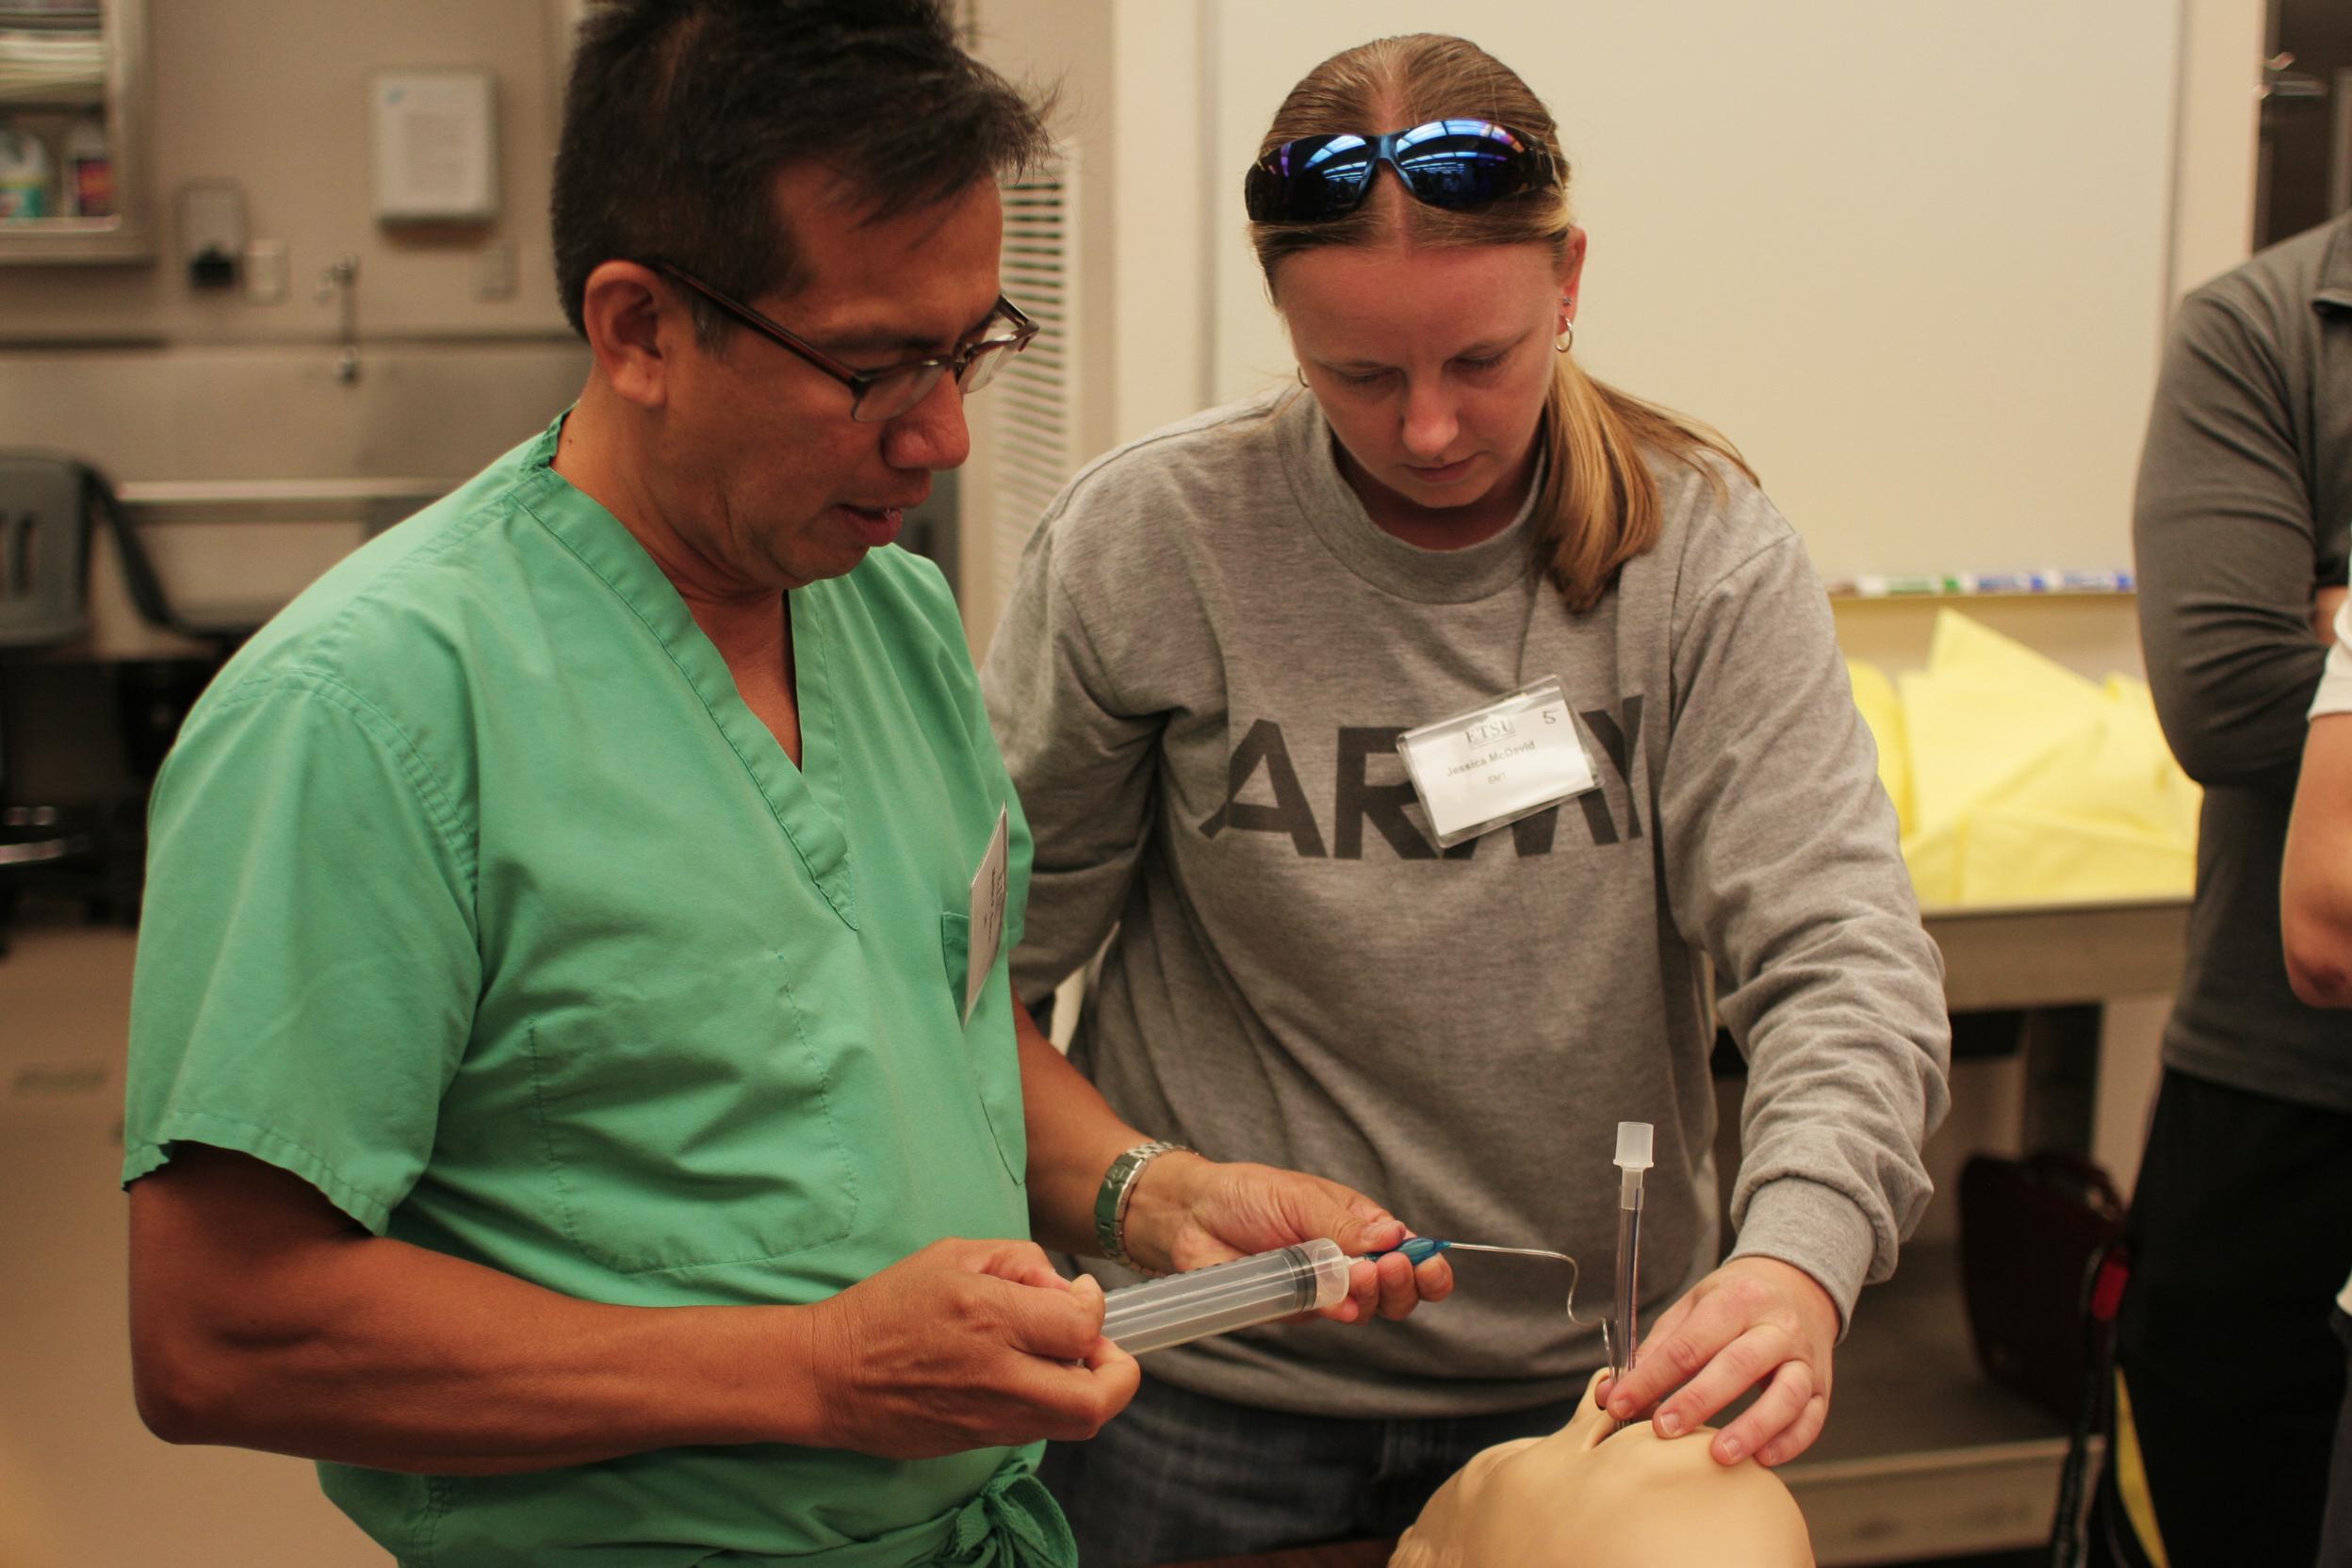 Dr. Martin Eason demonstrates proper airway management.